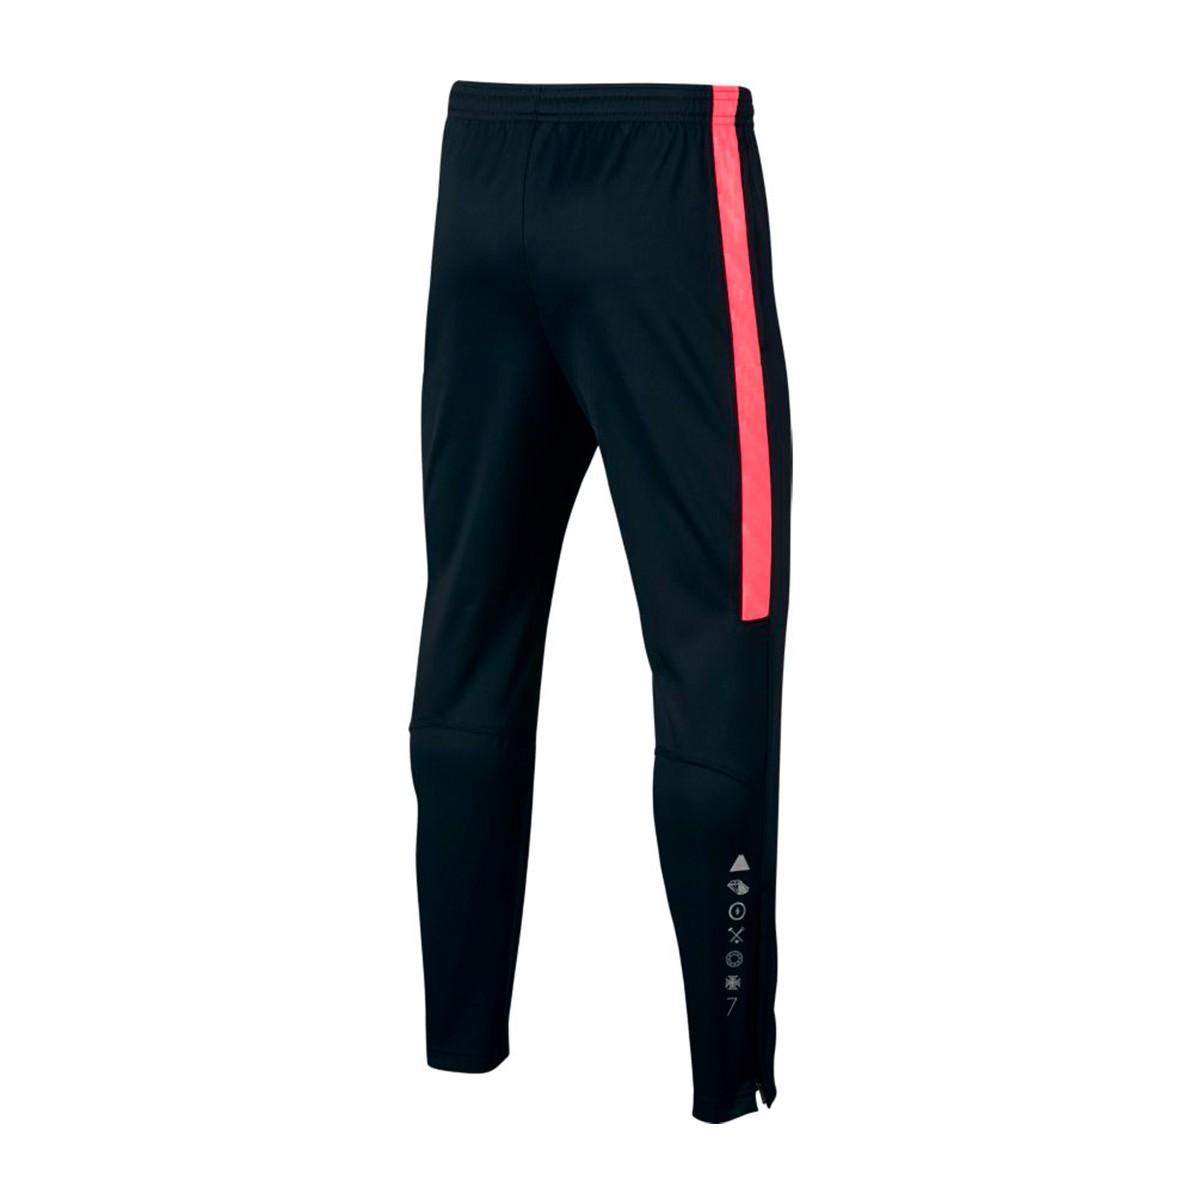 Gimnasta robo Ejército  Pantalon Nike Dri-FIT CR7 KPZ Niño Black-Hot punch - Boutique de football  Fútbol Emotion